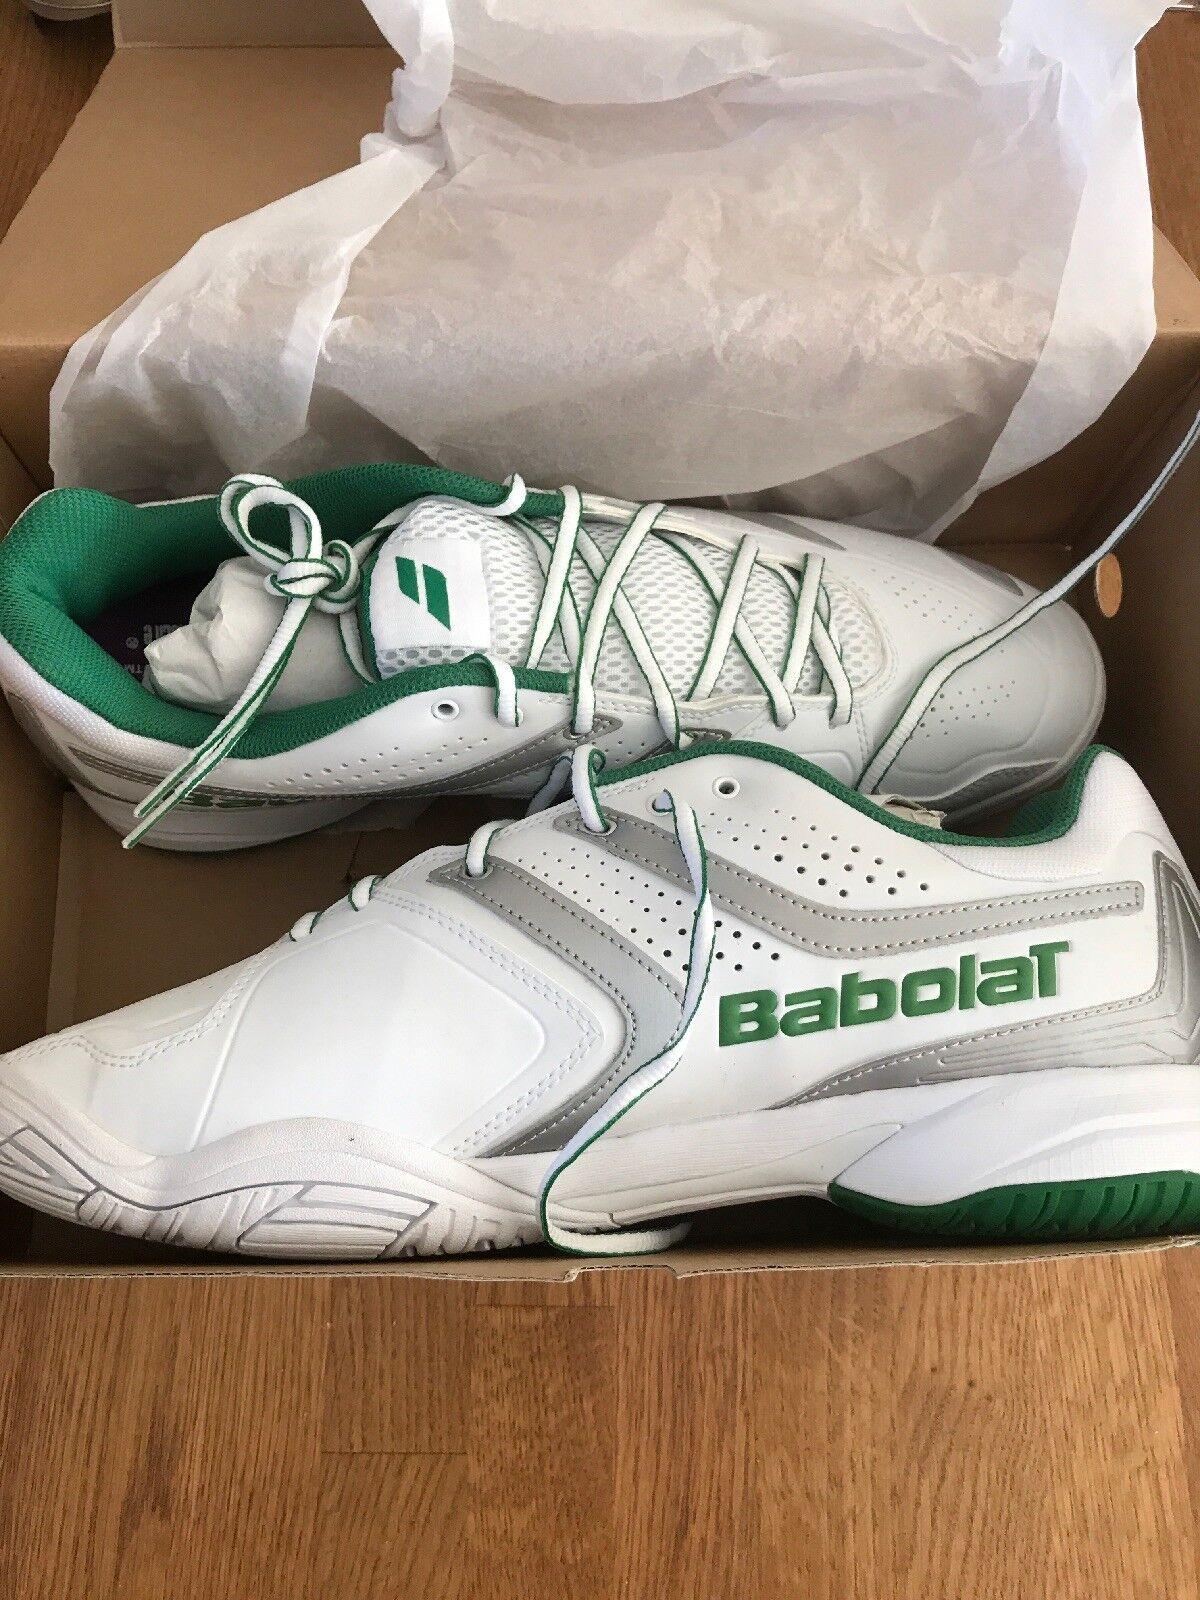 Babolat Drive 3 All Court Wimbledon Tennis Trainers - Size 13.5